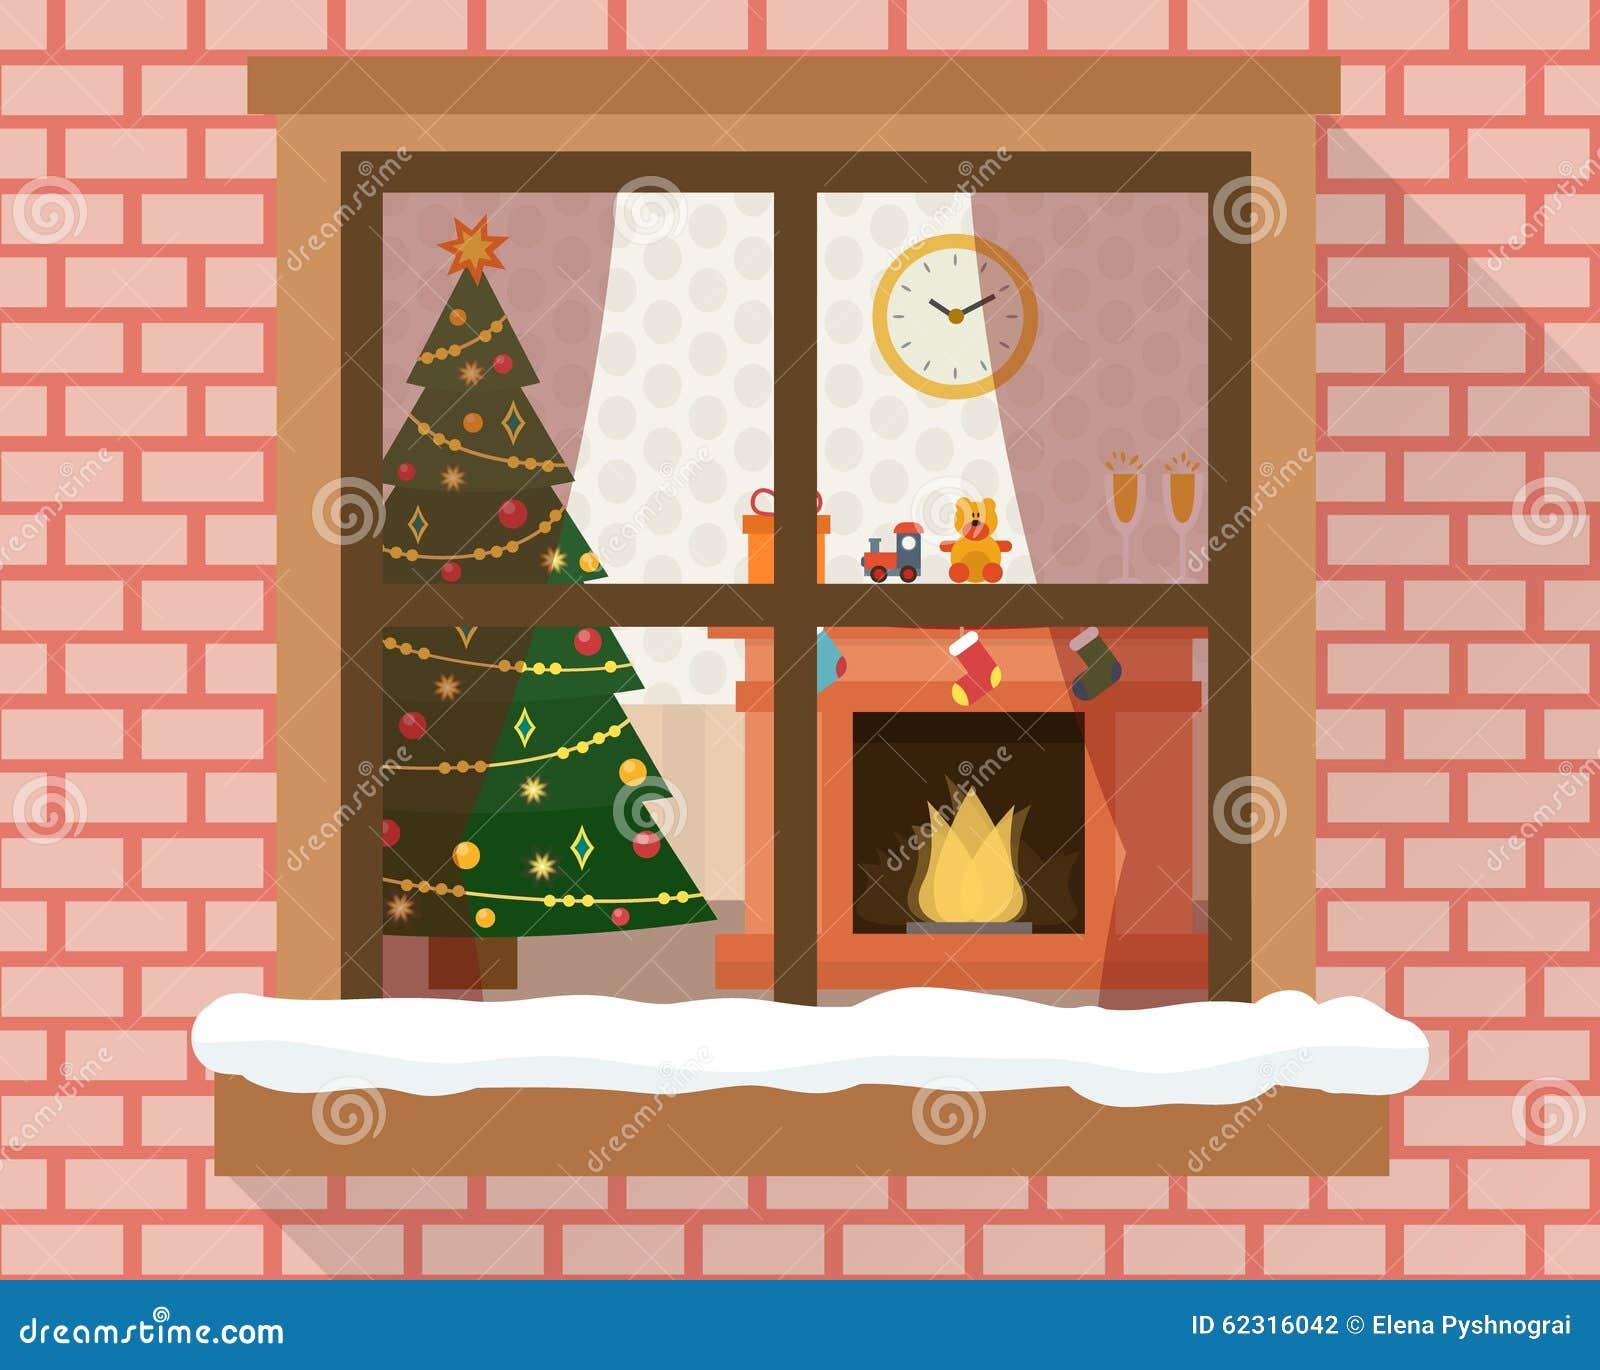 Christmas Room Stock Vector Image Of Illuminated: Christmas Room Through The Window Stock Vector